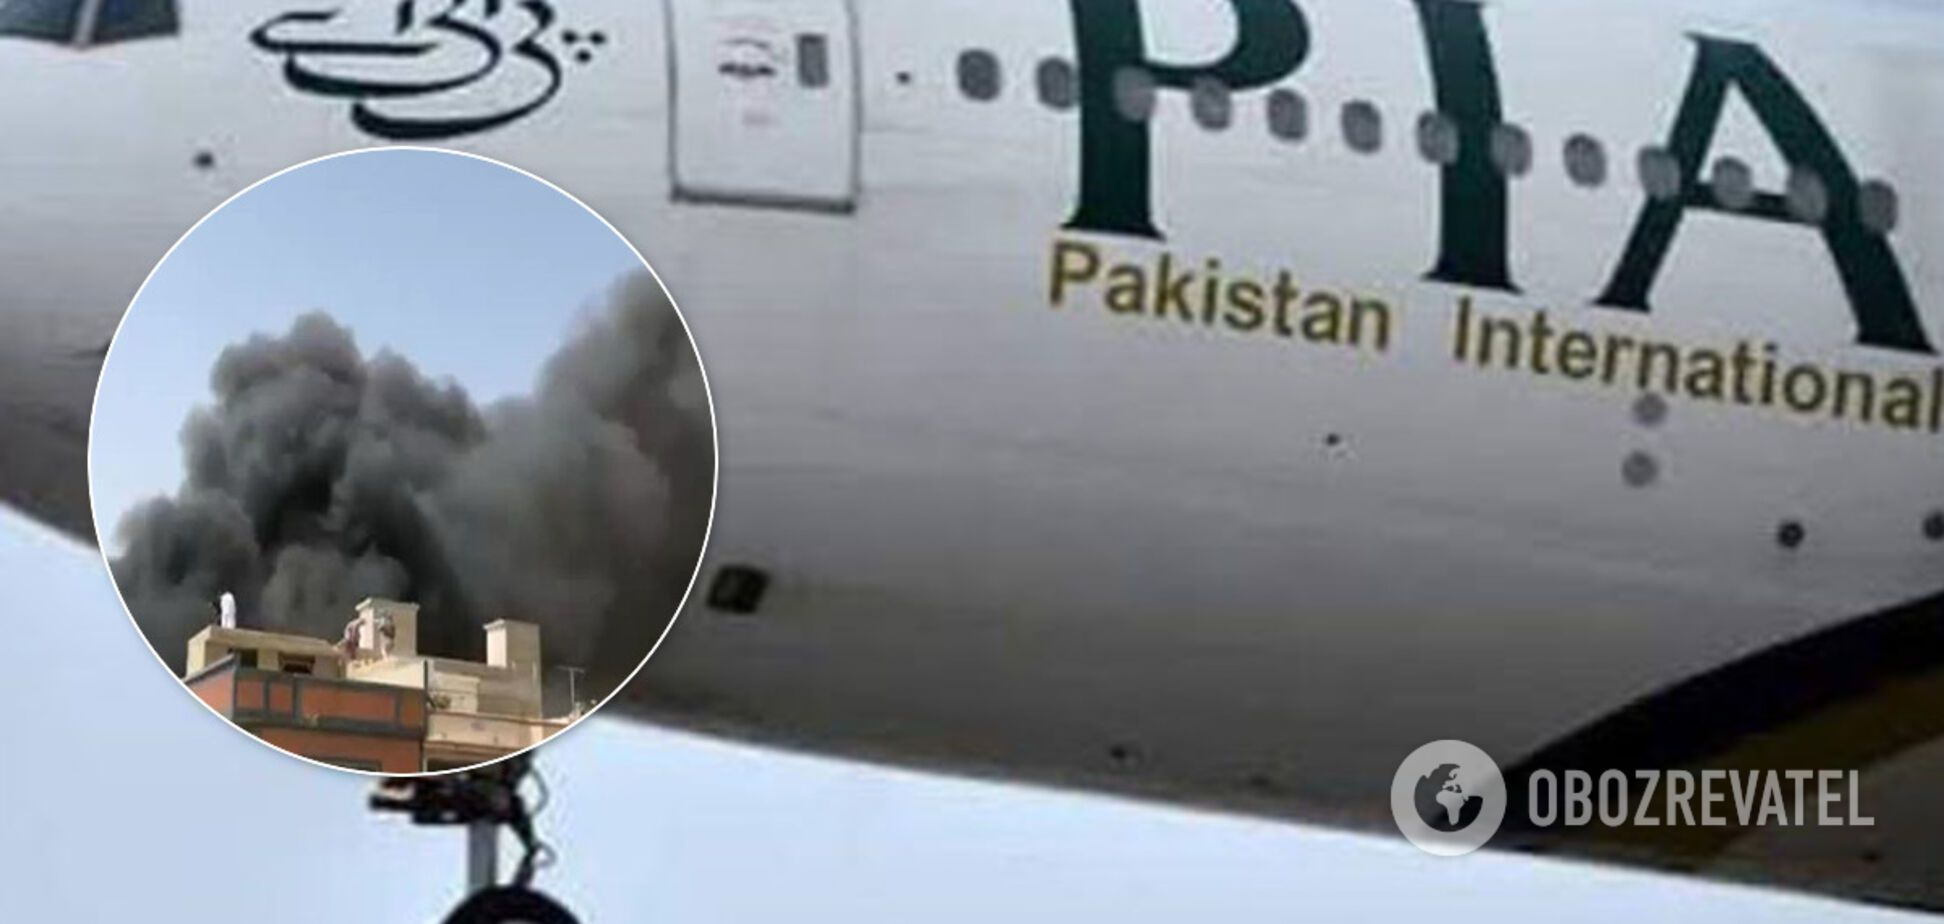 Катастрофа самолета в Пакистане: названа причина смертельного ЧП